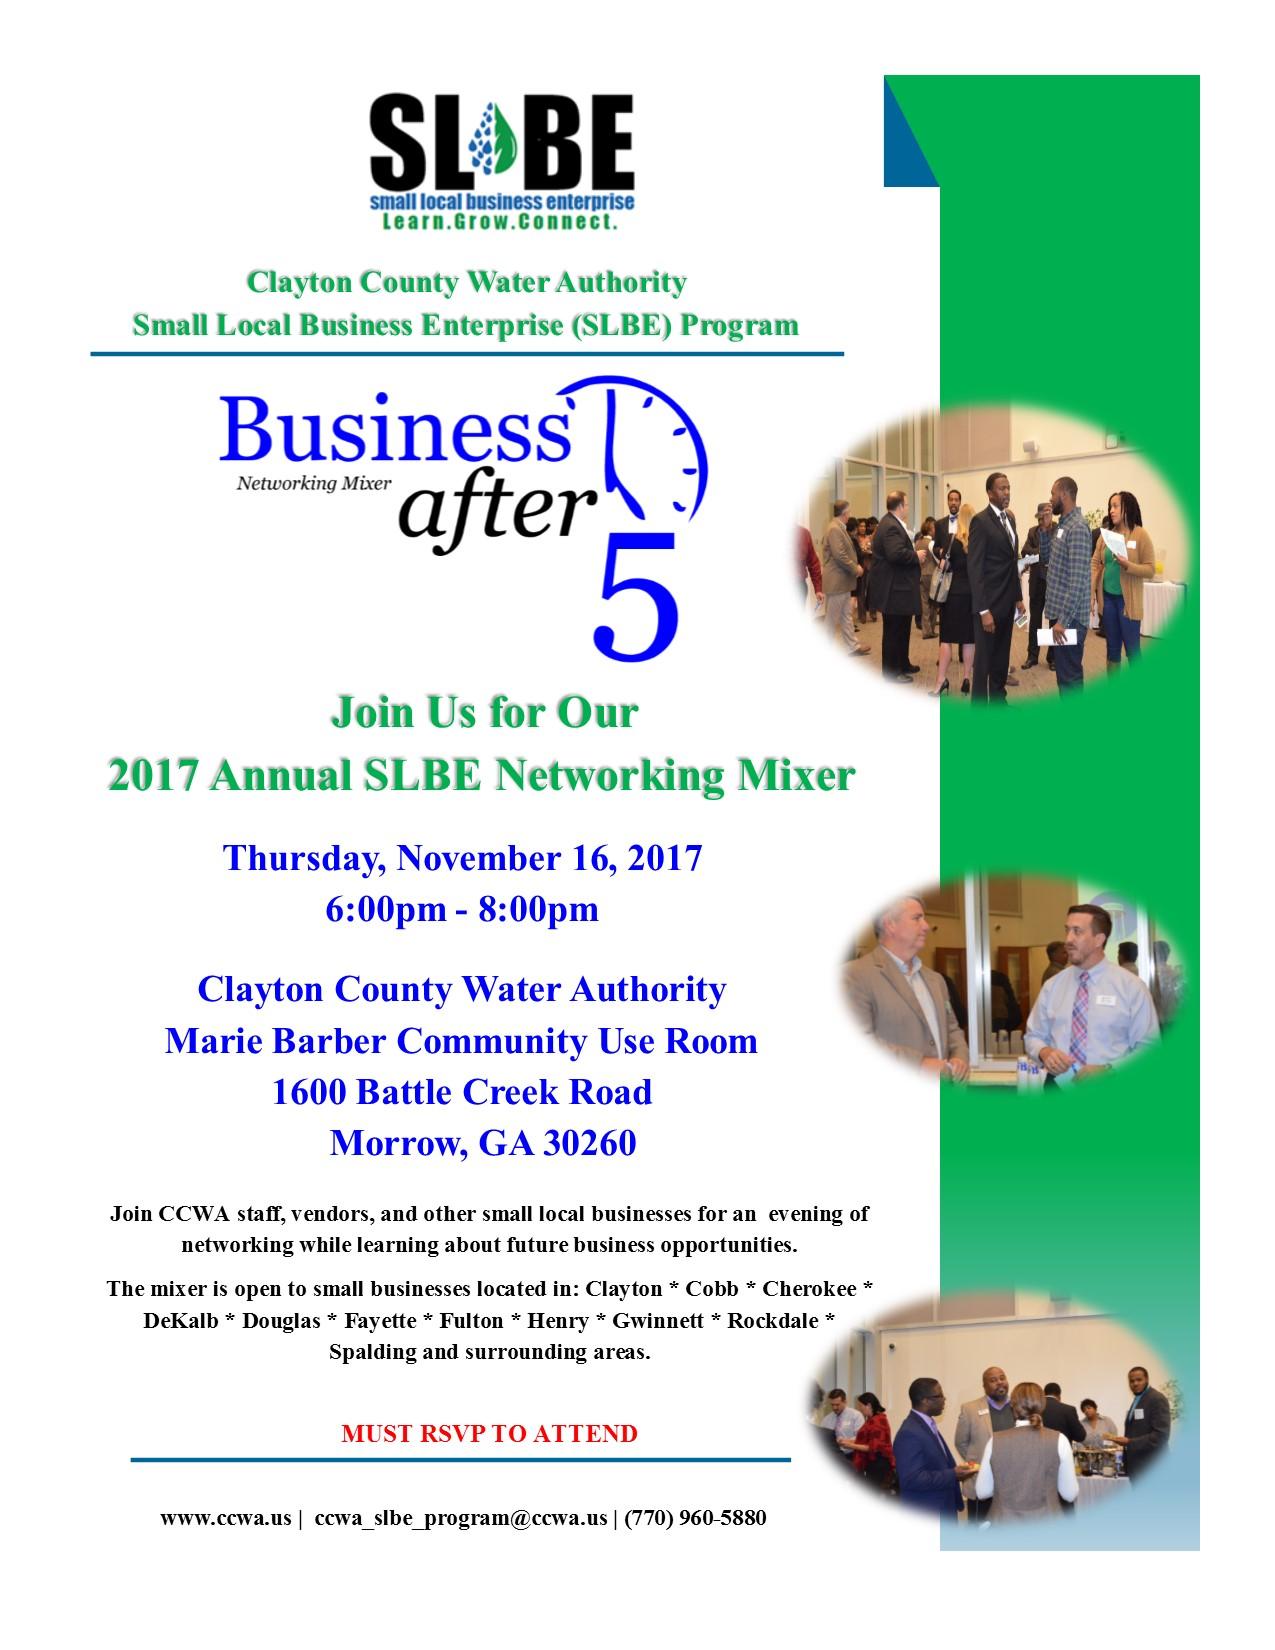 2017 Annual Mixer Flyer